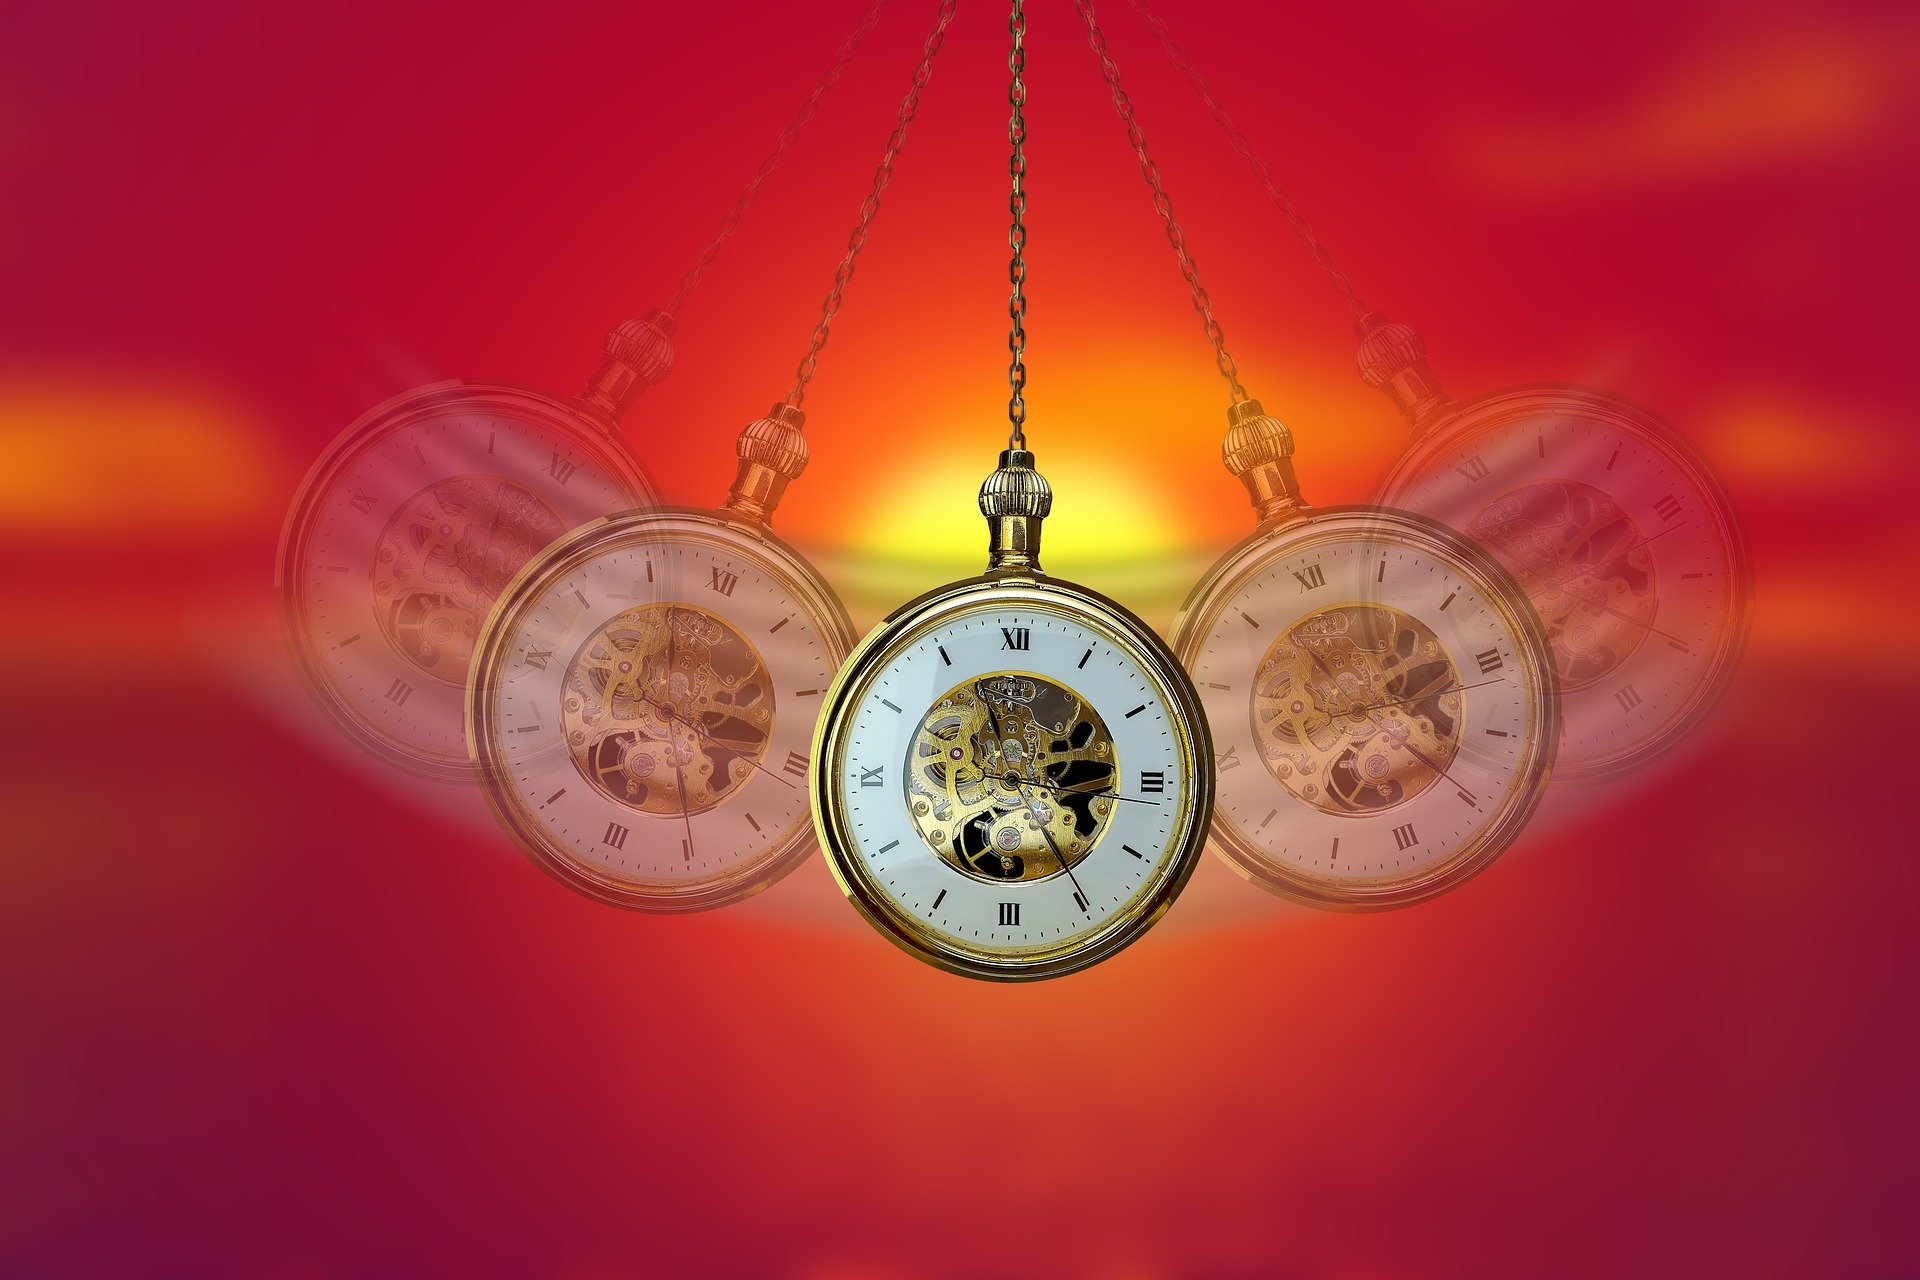 metodo beliz hipnosis reloj